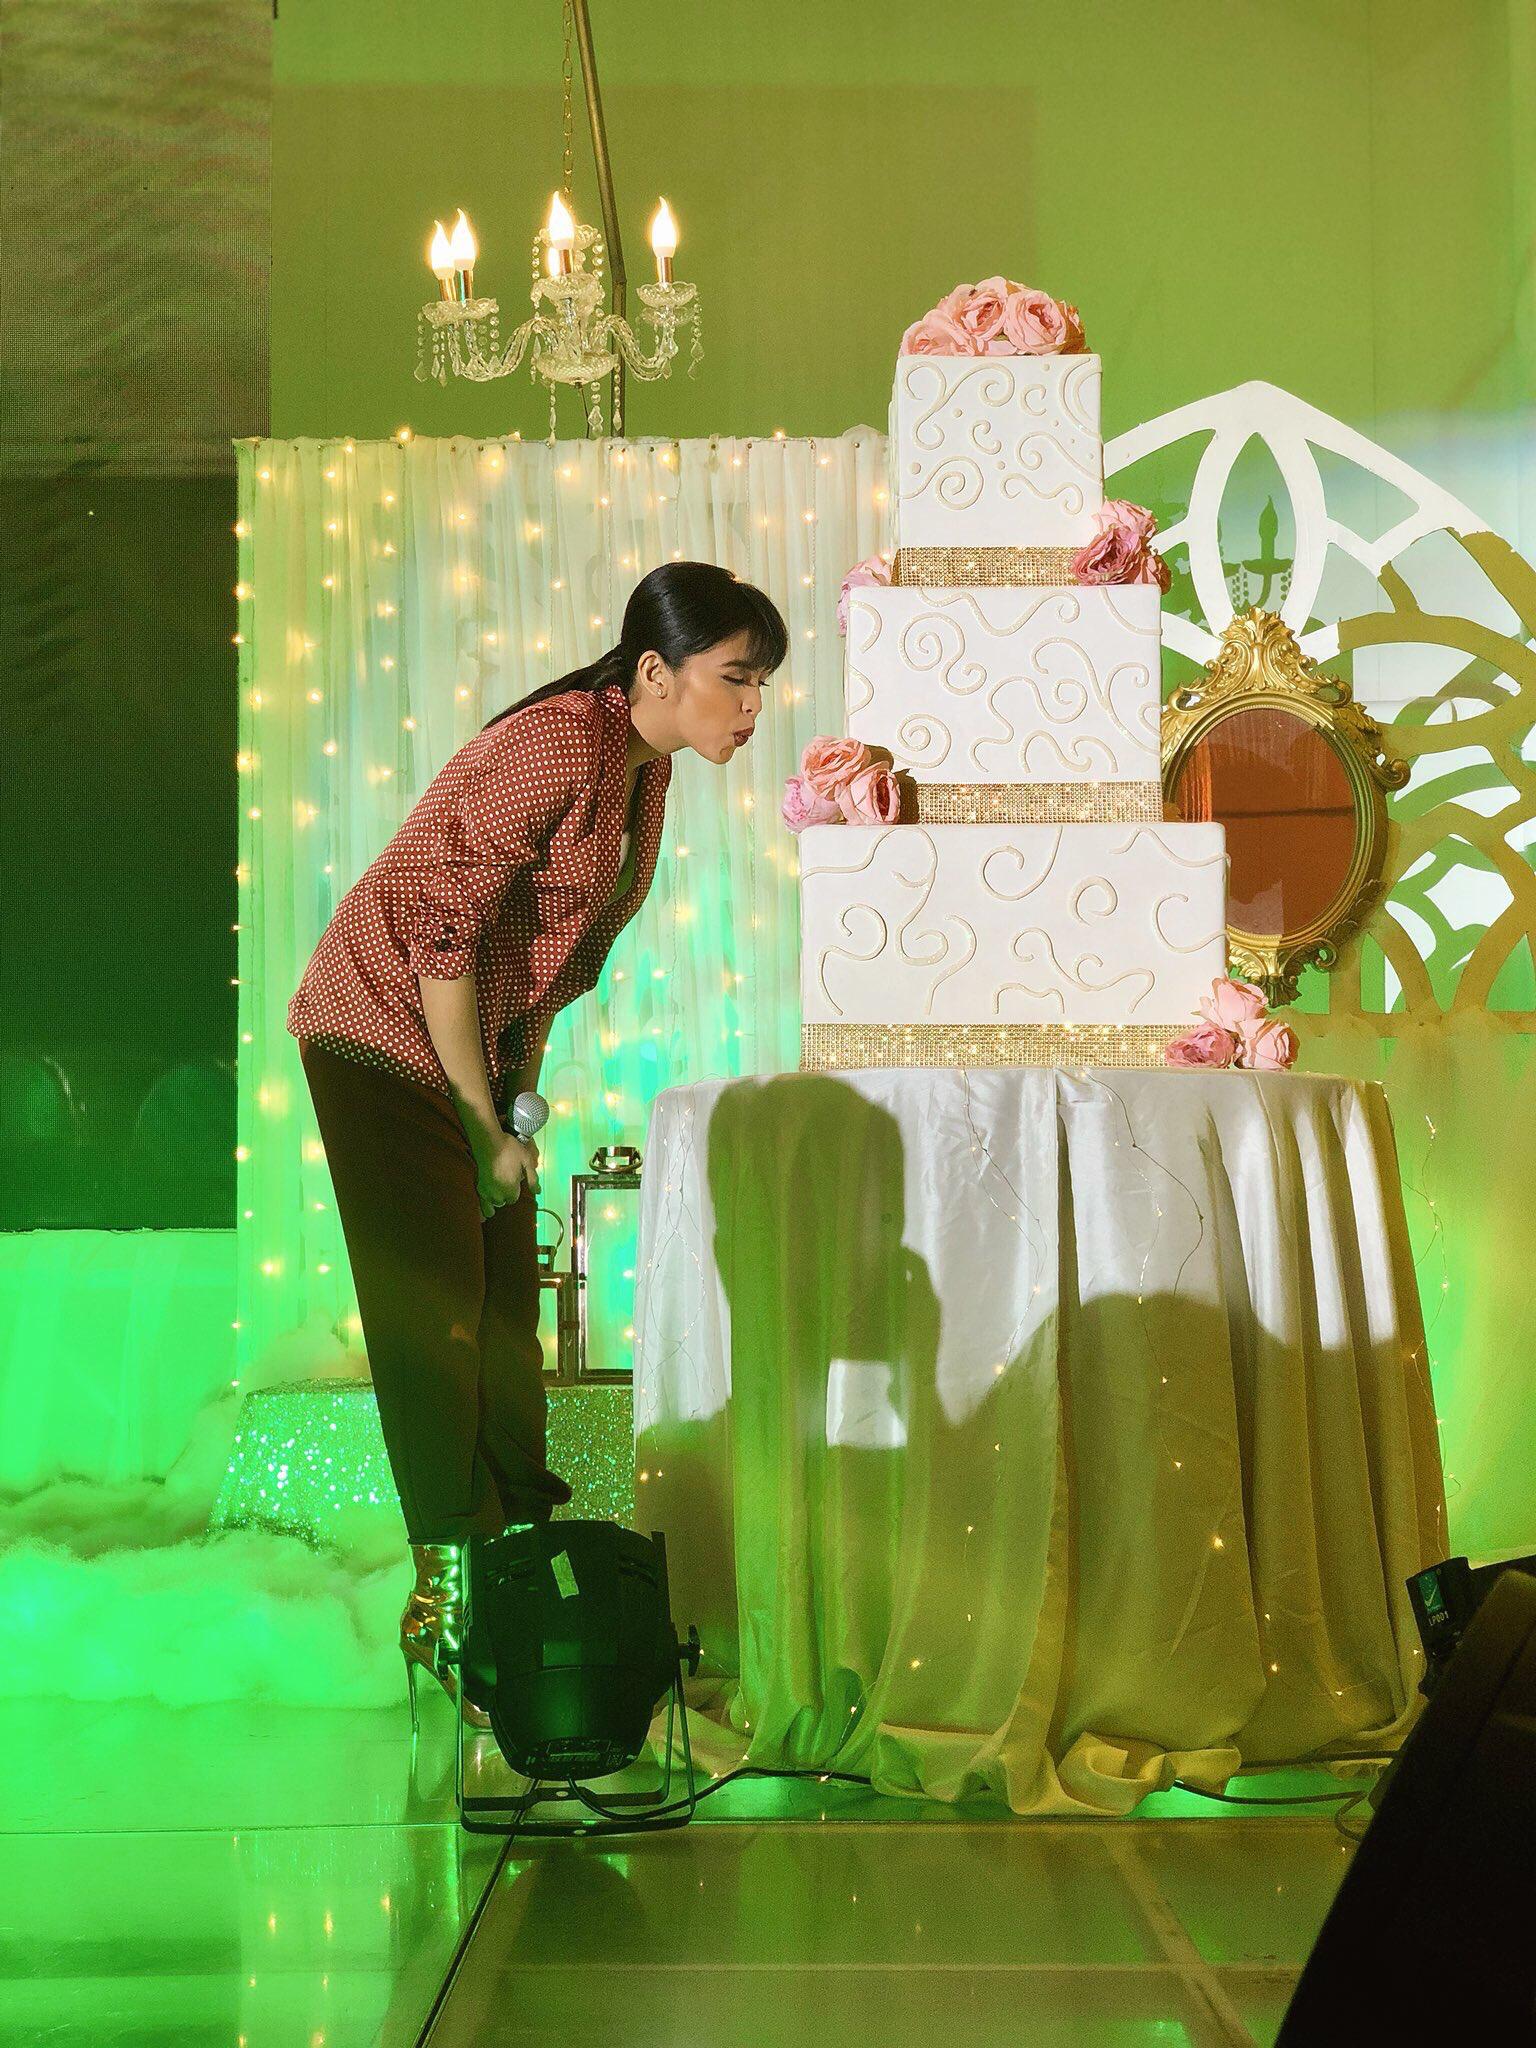 5th Birthday Party This Month Grabehan Maraming Salamat MaineMagicalAt23